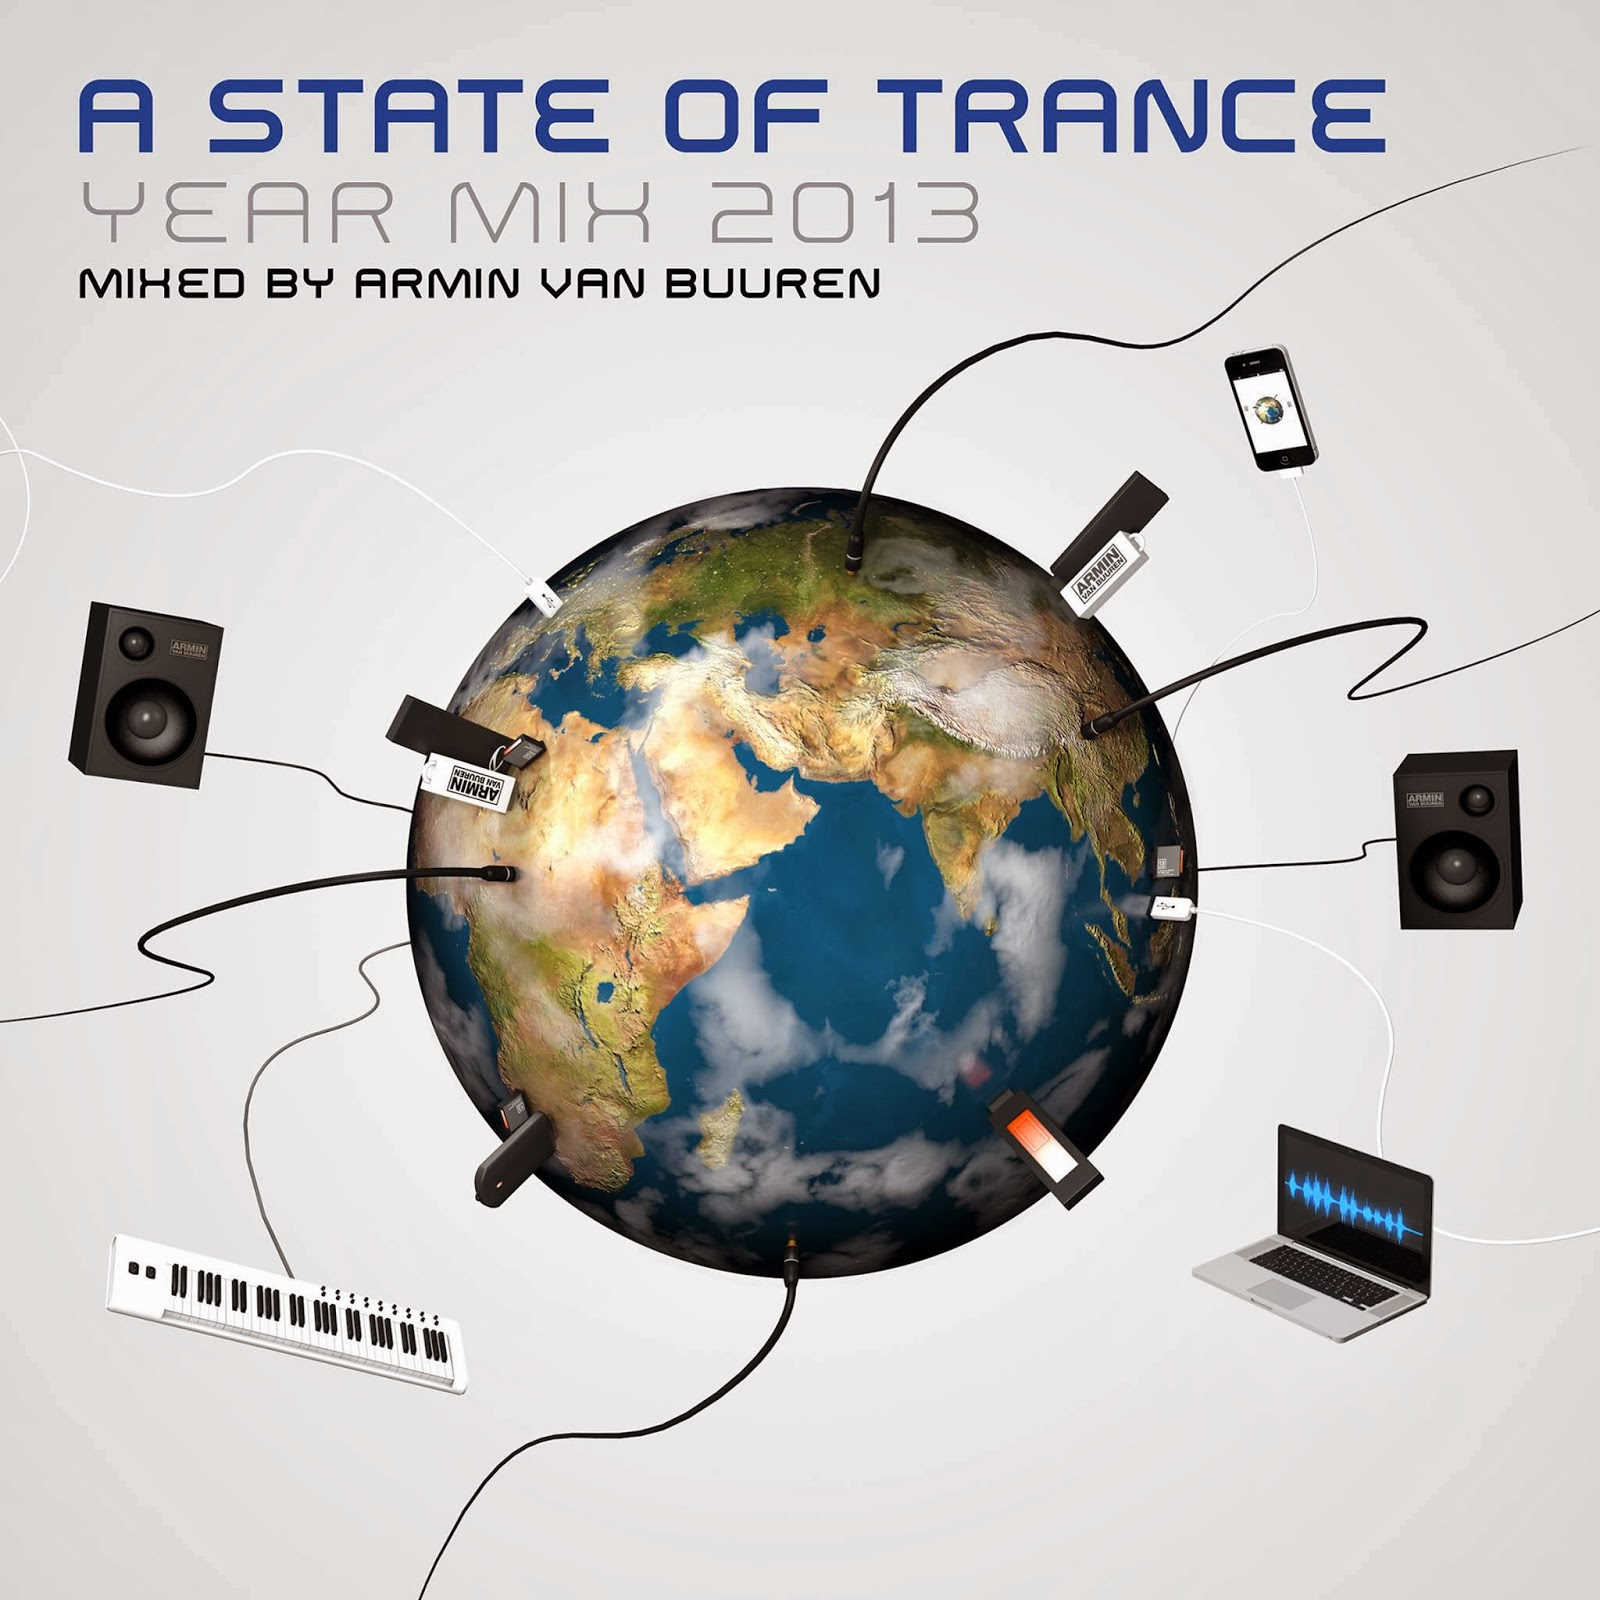 A state of trance 387 скачать - 4d